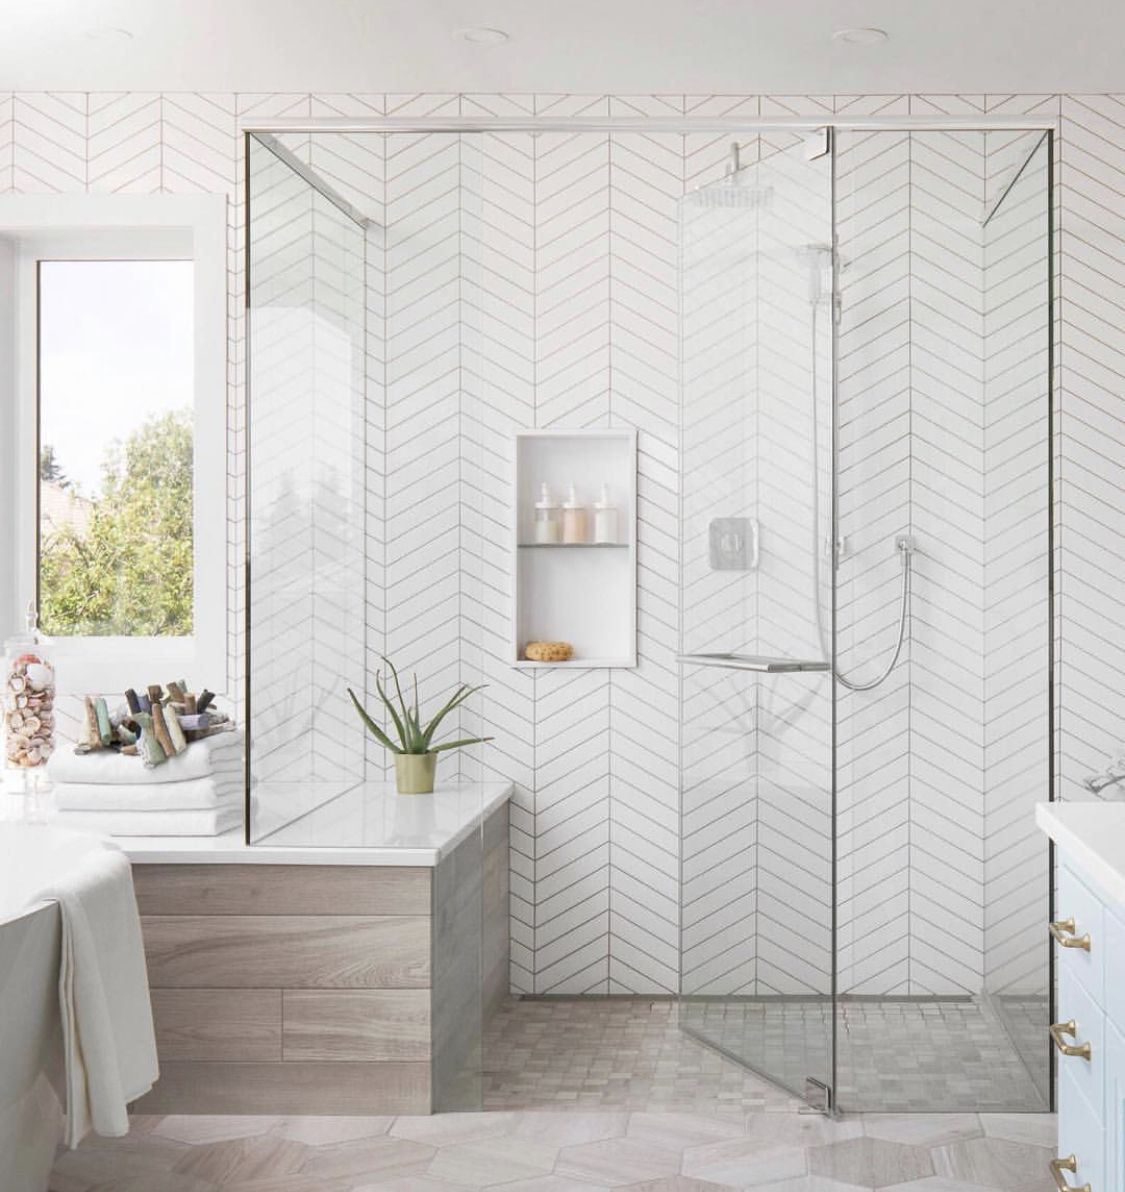 Pin By Tamara Spence On Bathroom Bathroom Interior Design Bathroom Interior White Herringbone Tile